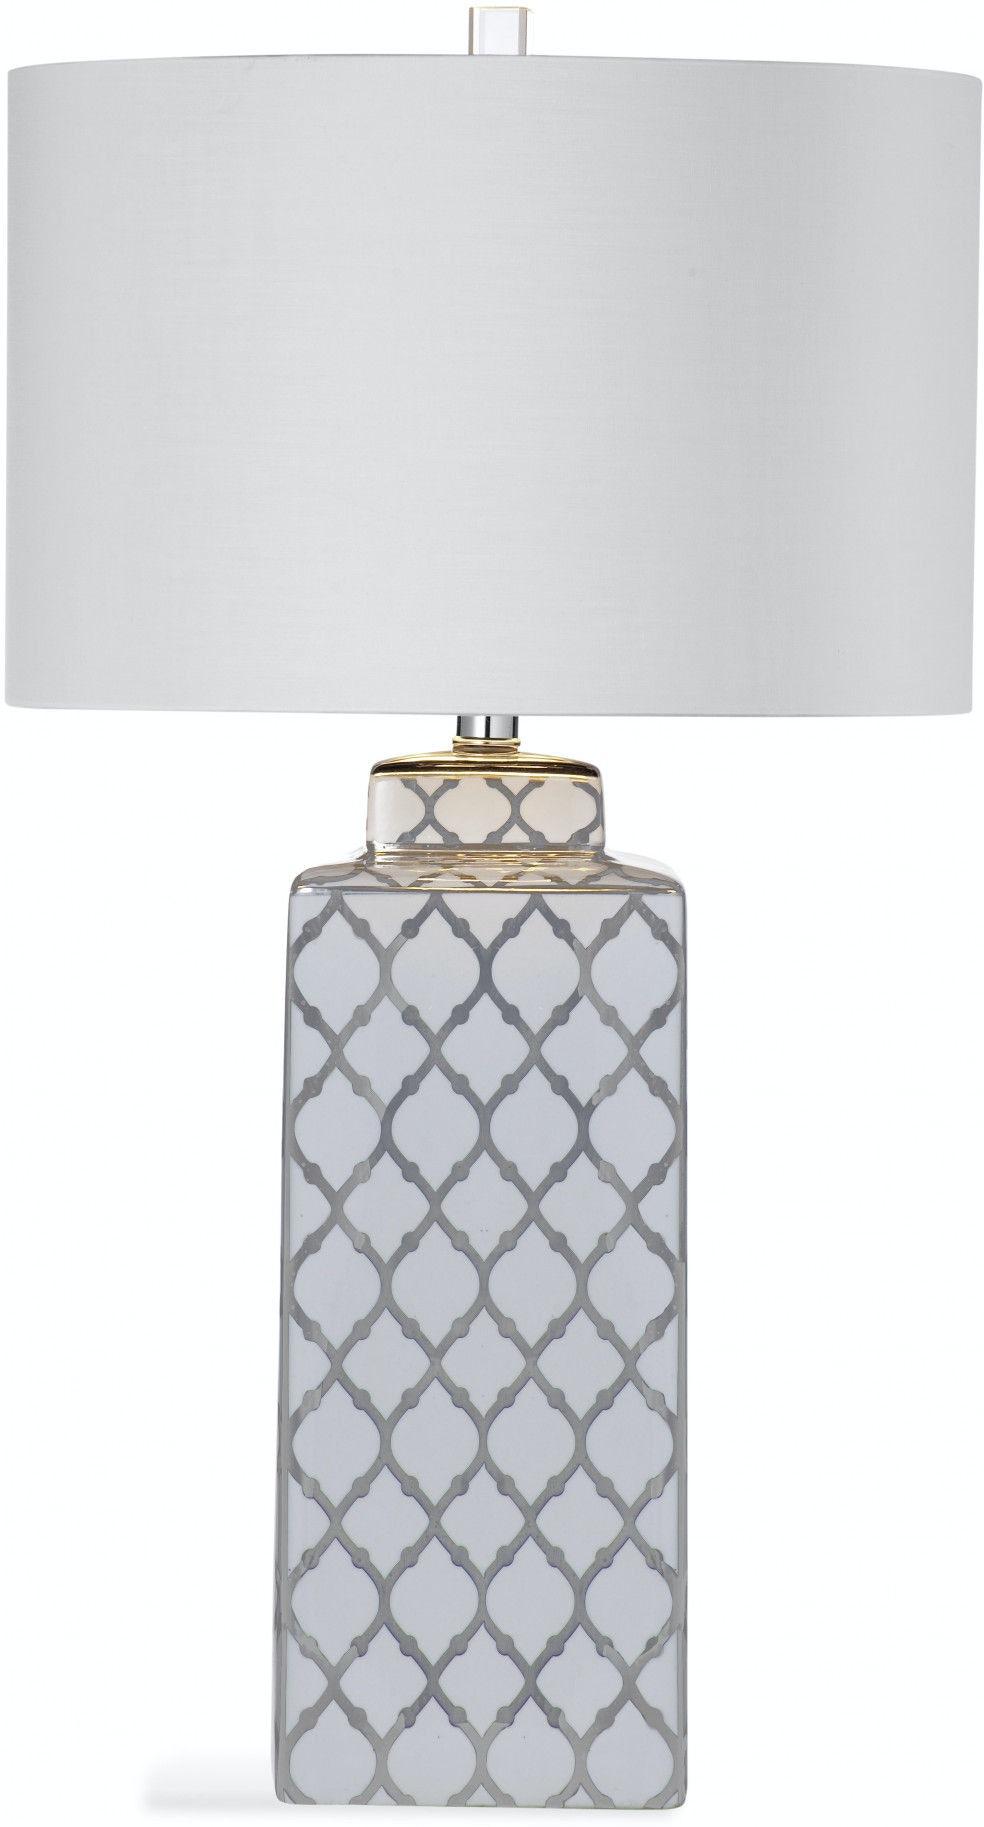 Sydney Table Lamp Btml3335t